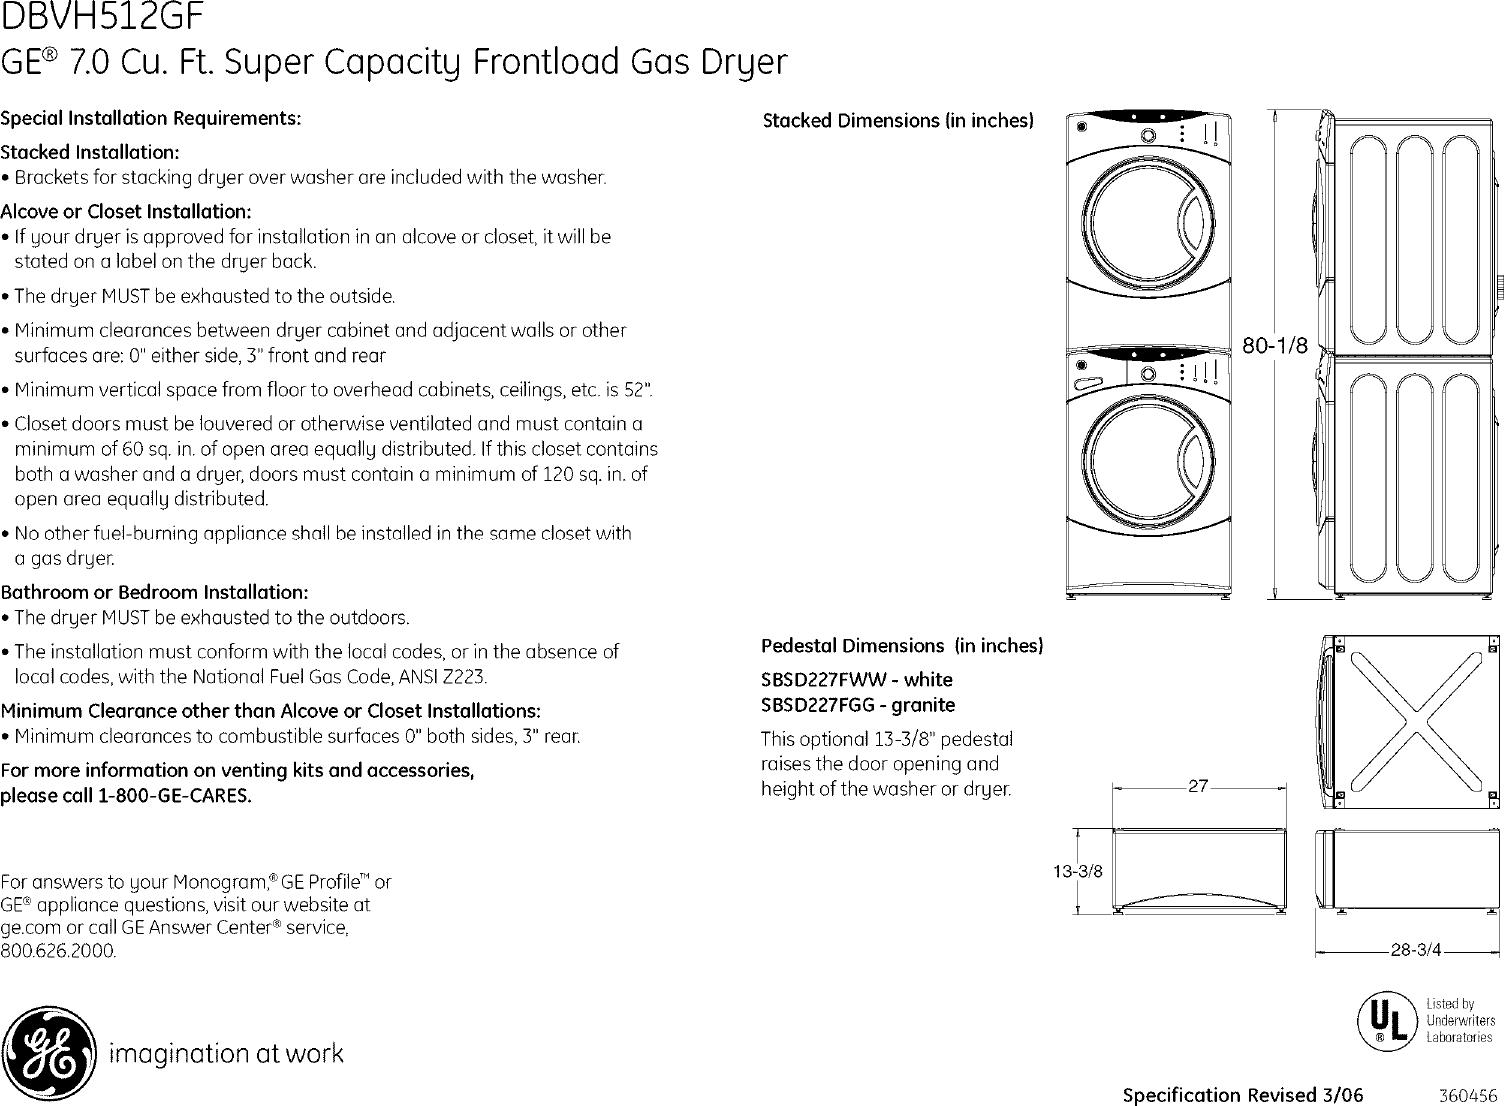 Kenmore Gas Dryer Wiring Diagram Manual Guide